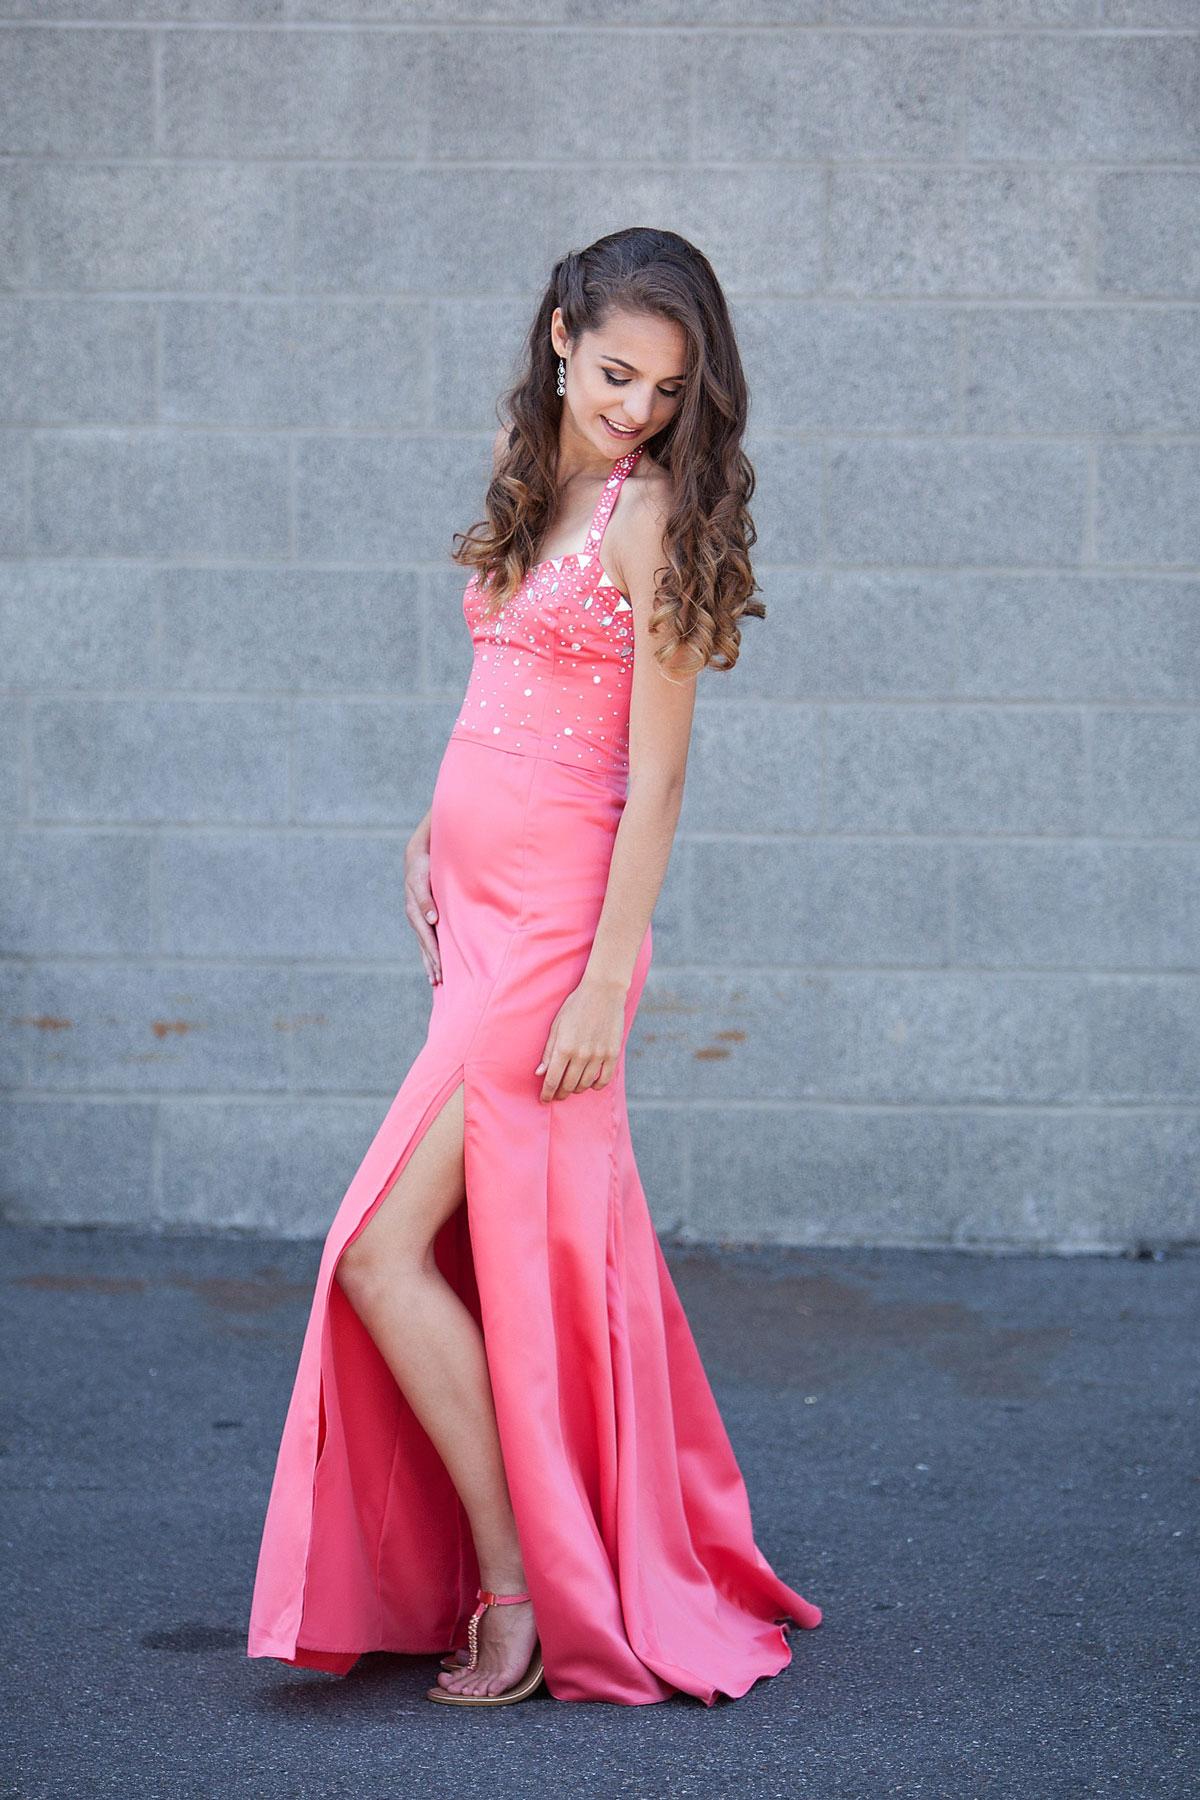 Consignment Gowns - Elizabeth Lambert Designs